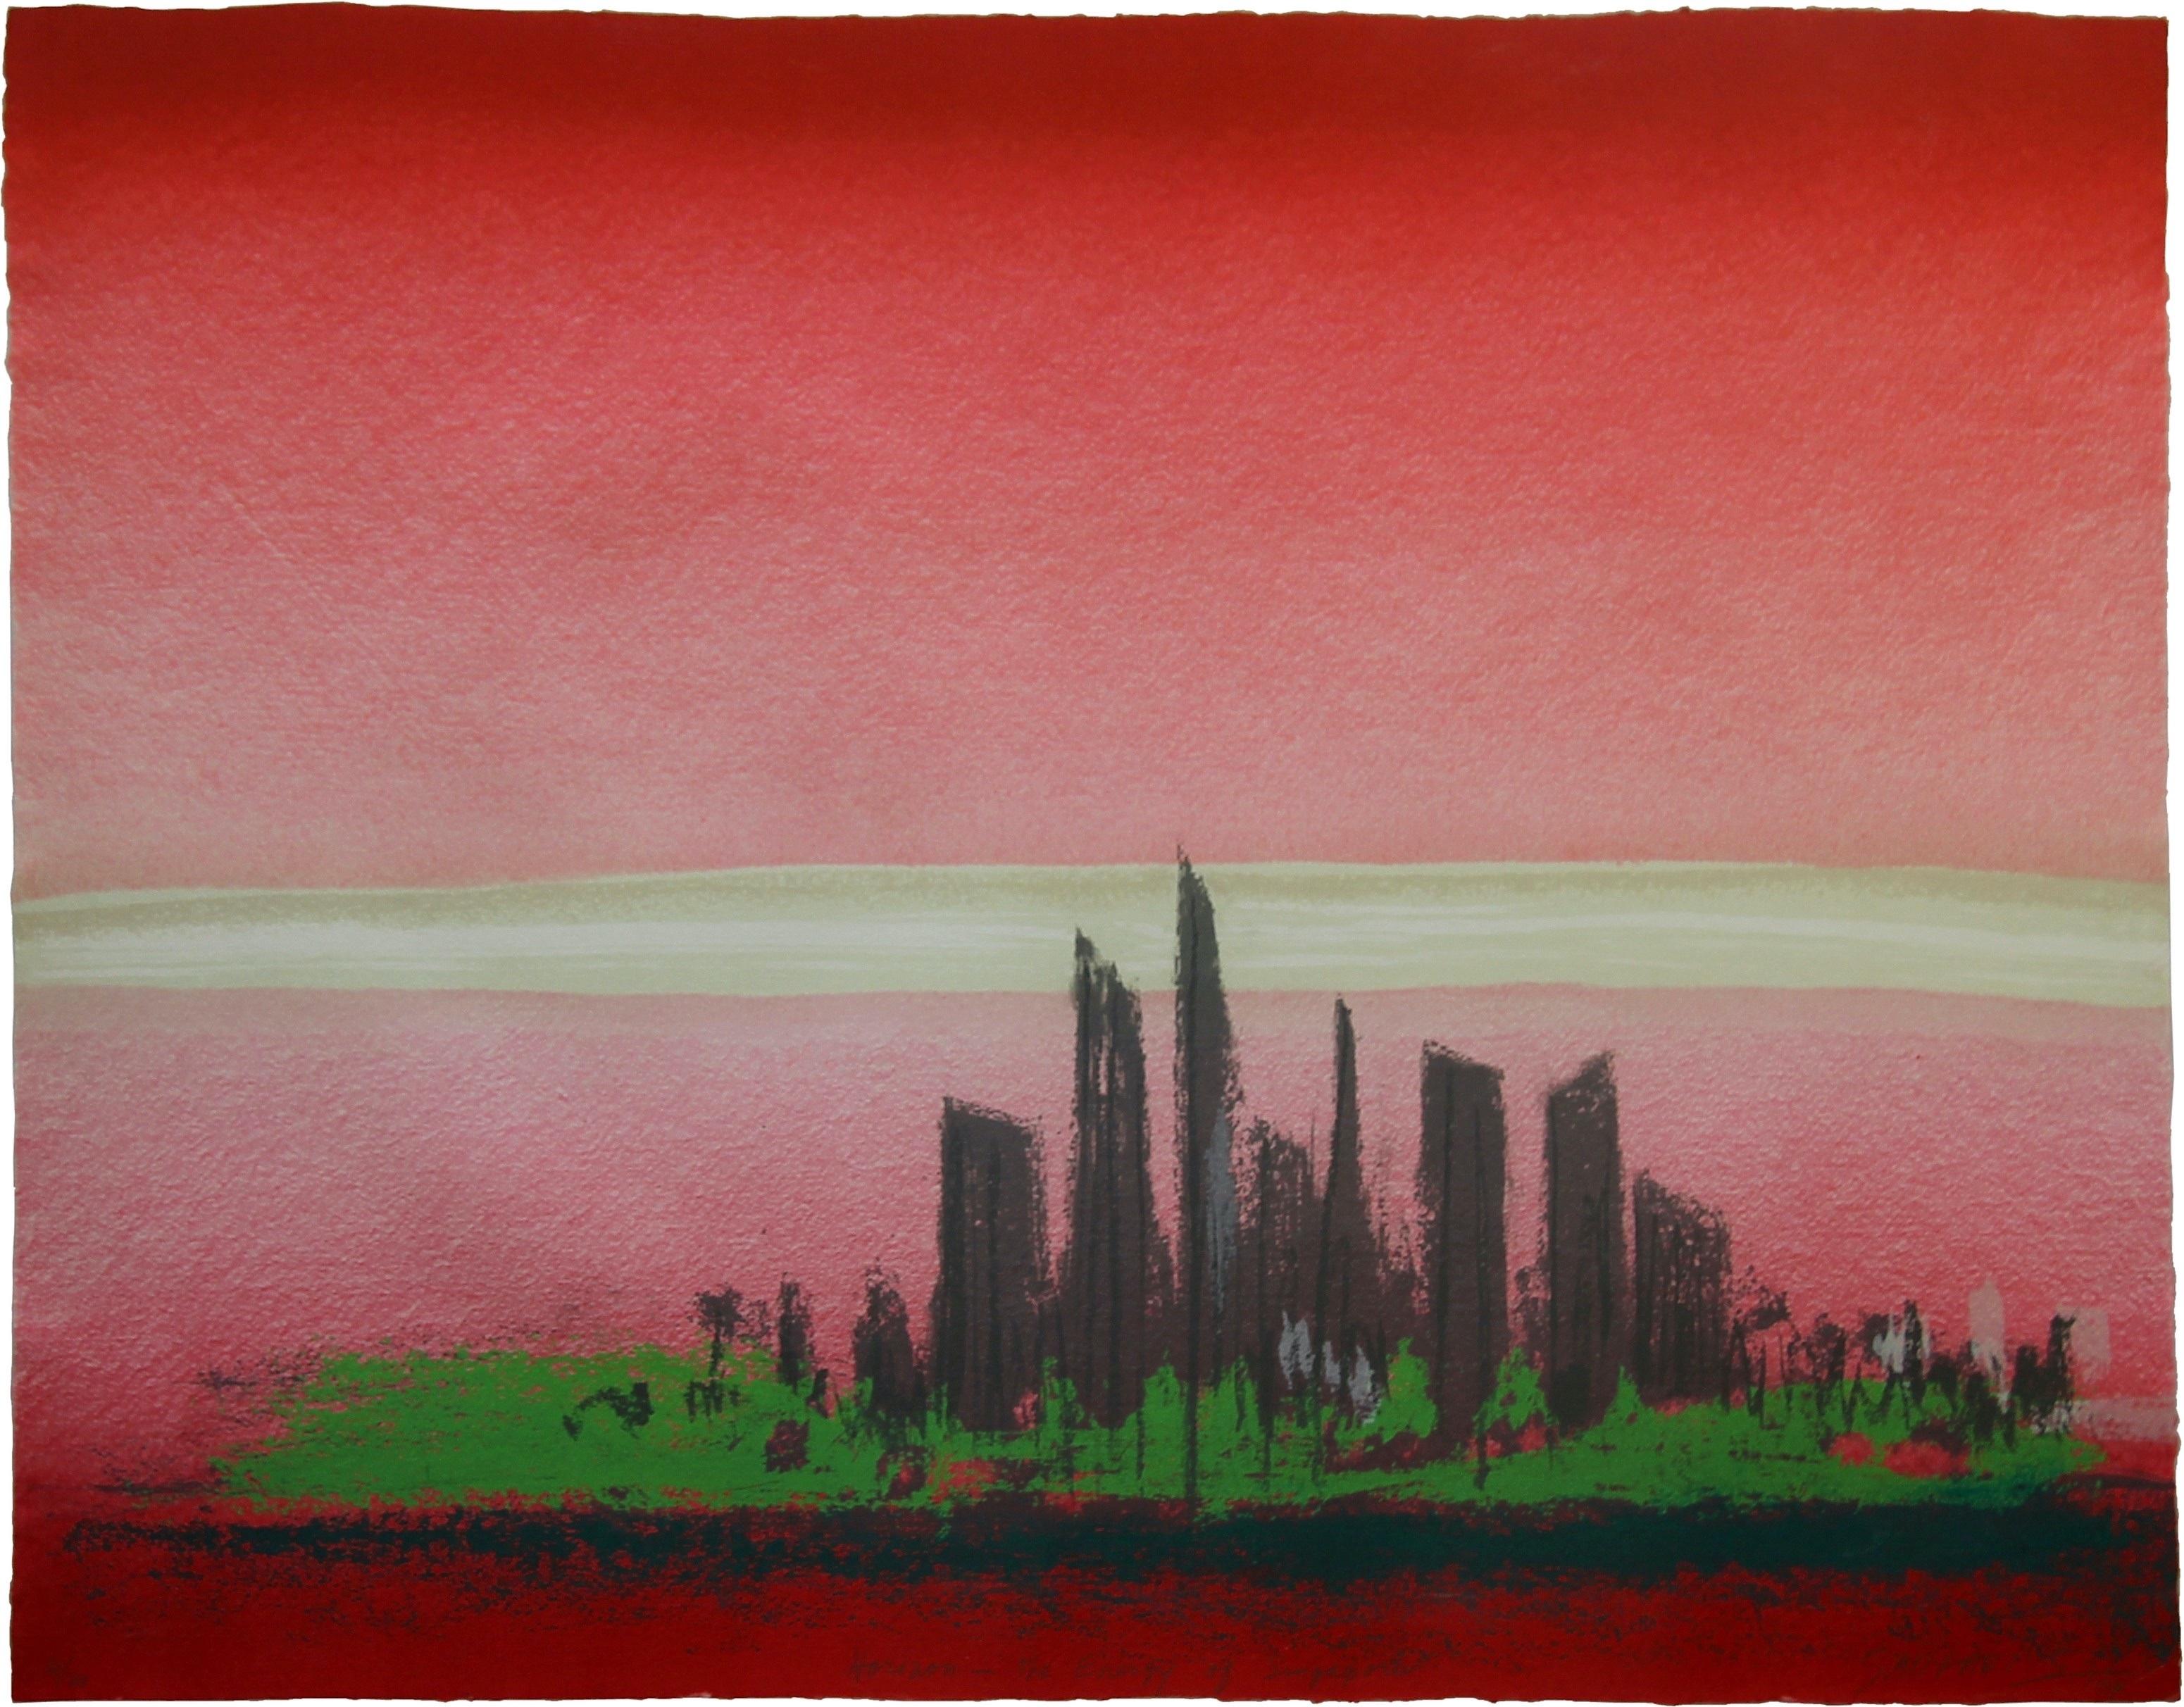 Srihadi Soedarsono - Horizon - The Energy of Singapore.jpg